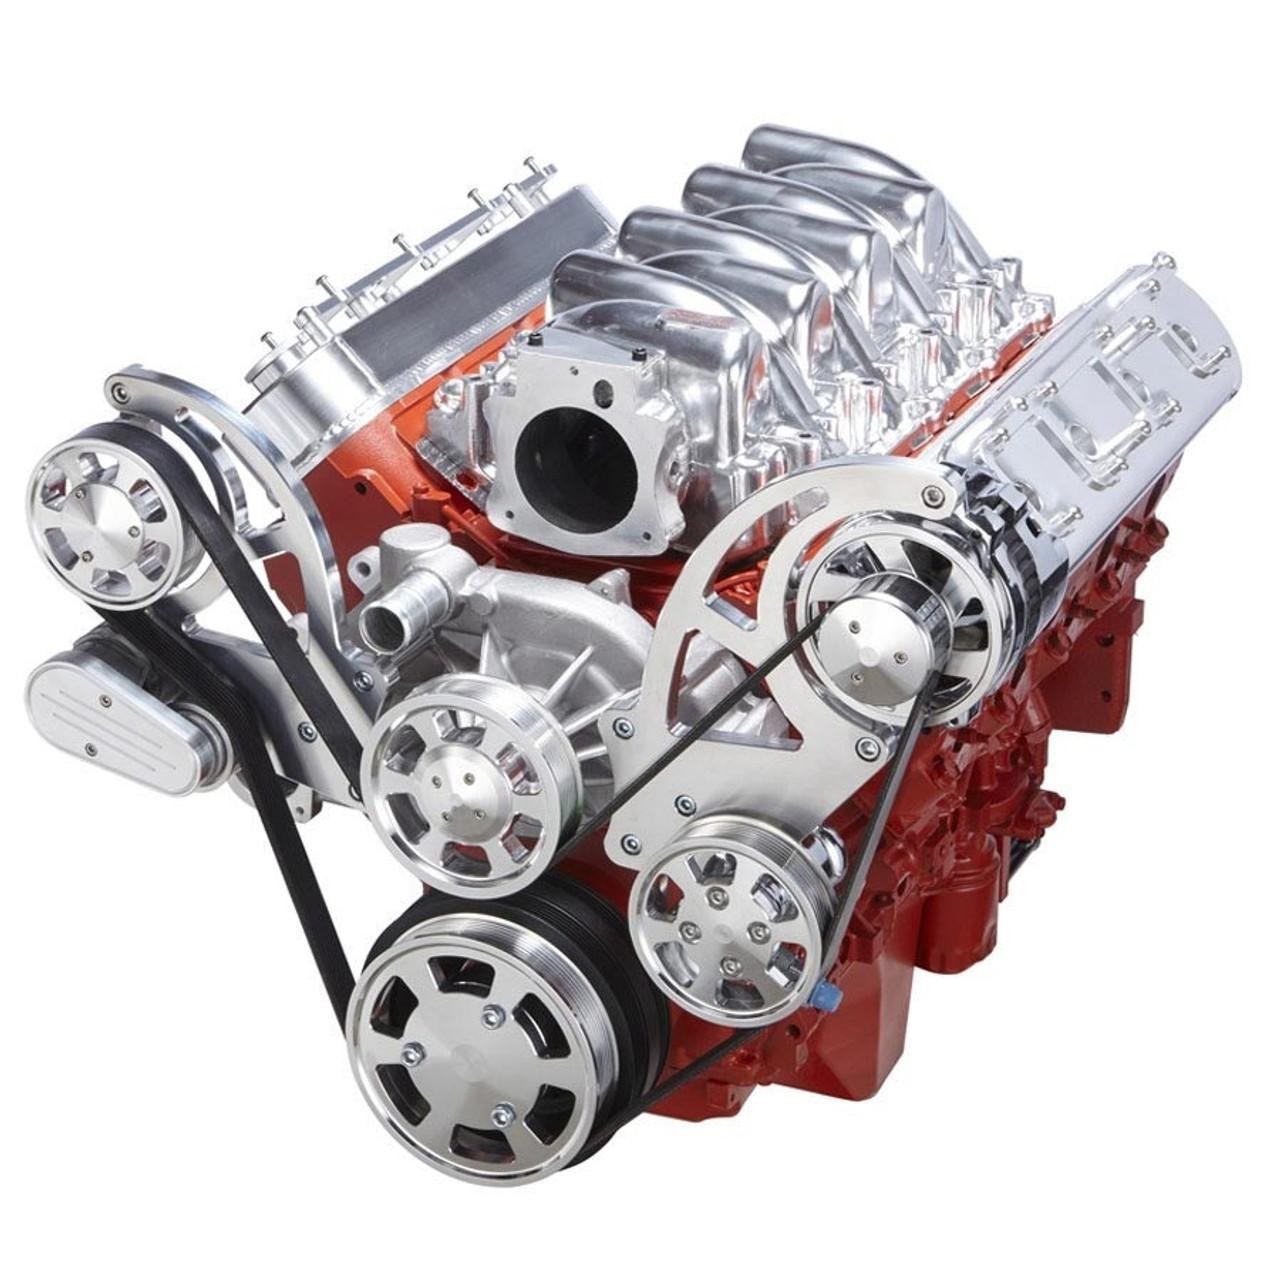 small resolution of chevy ls serpentine kit power steering alternator